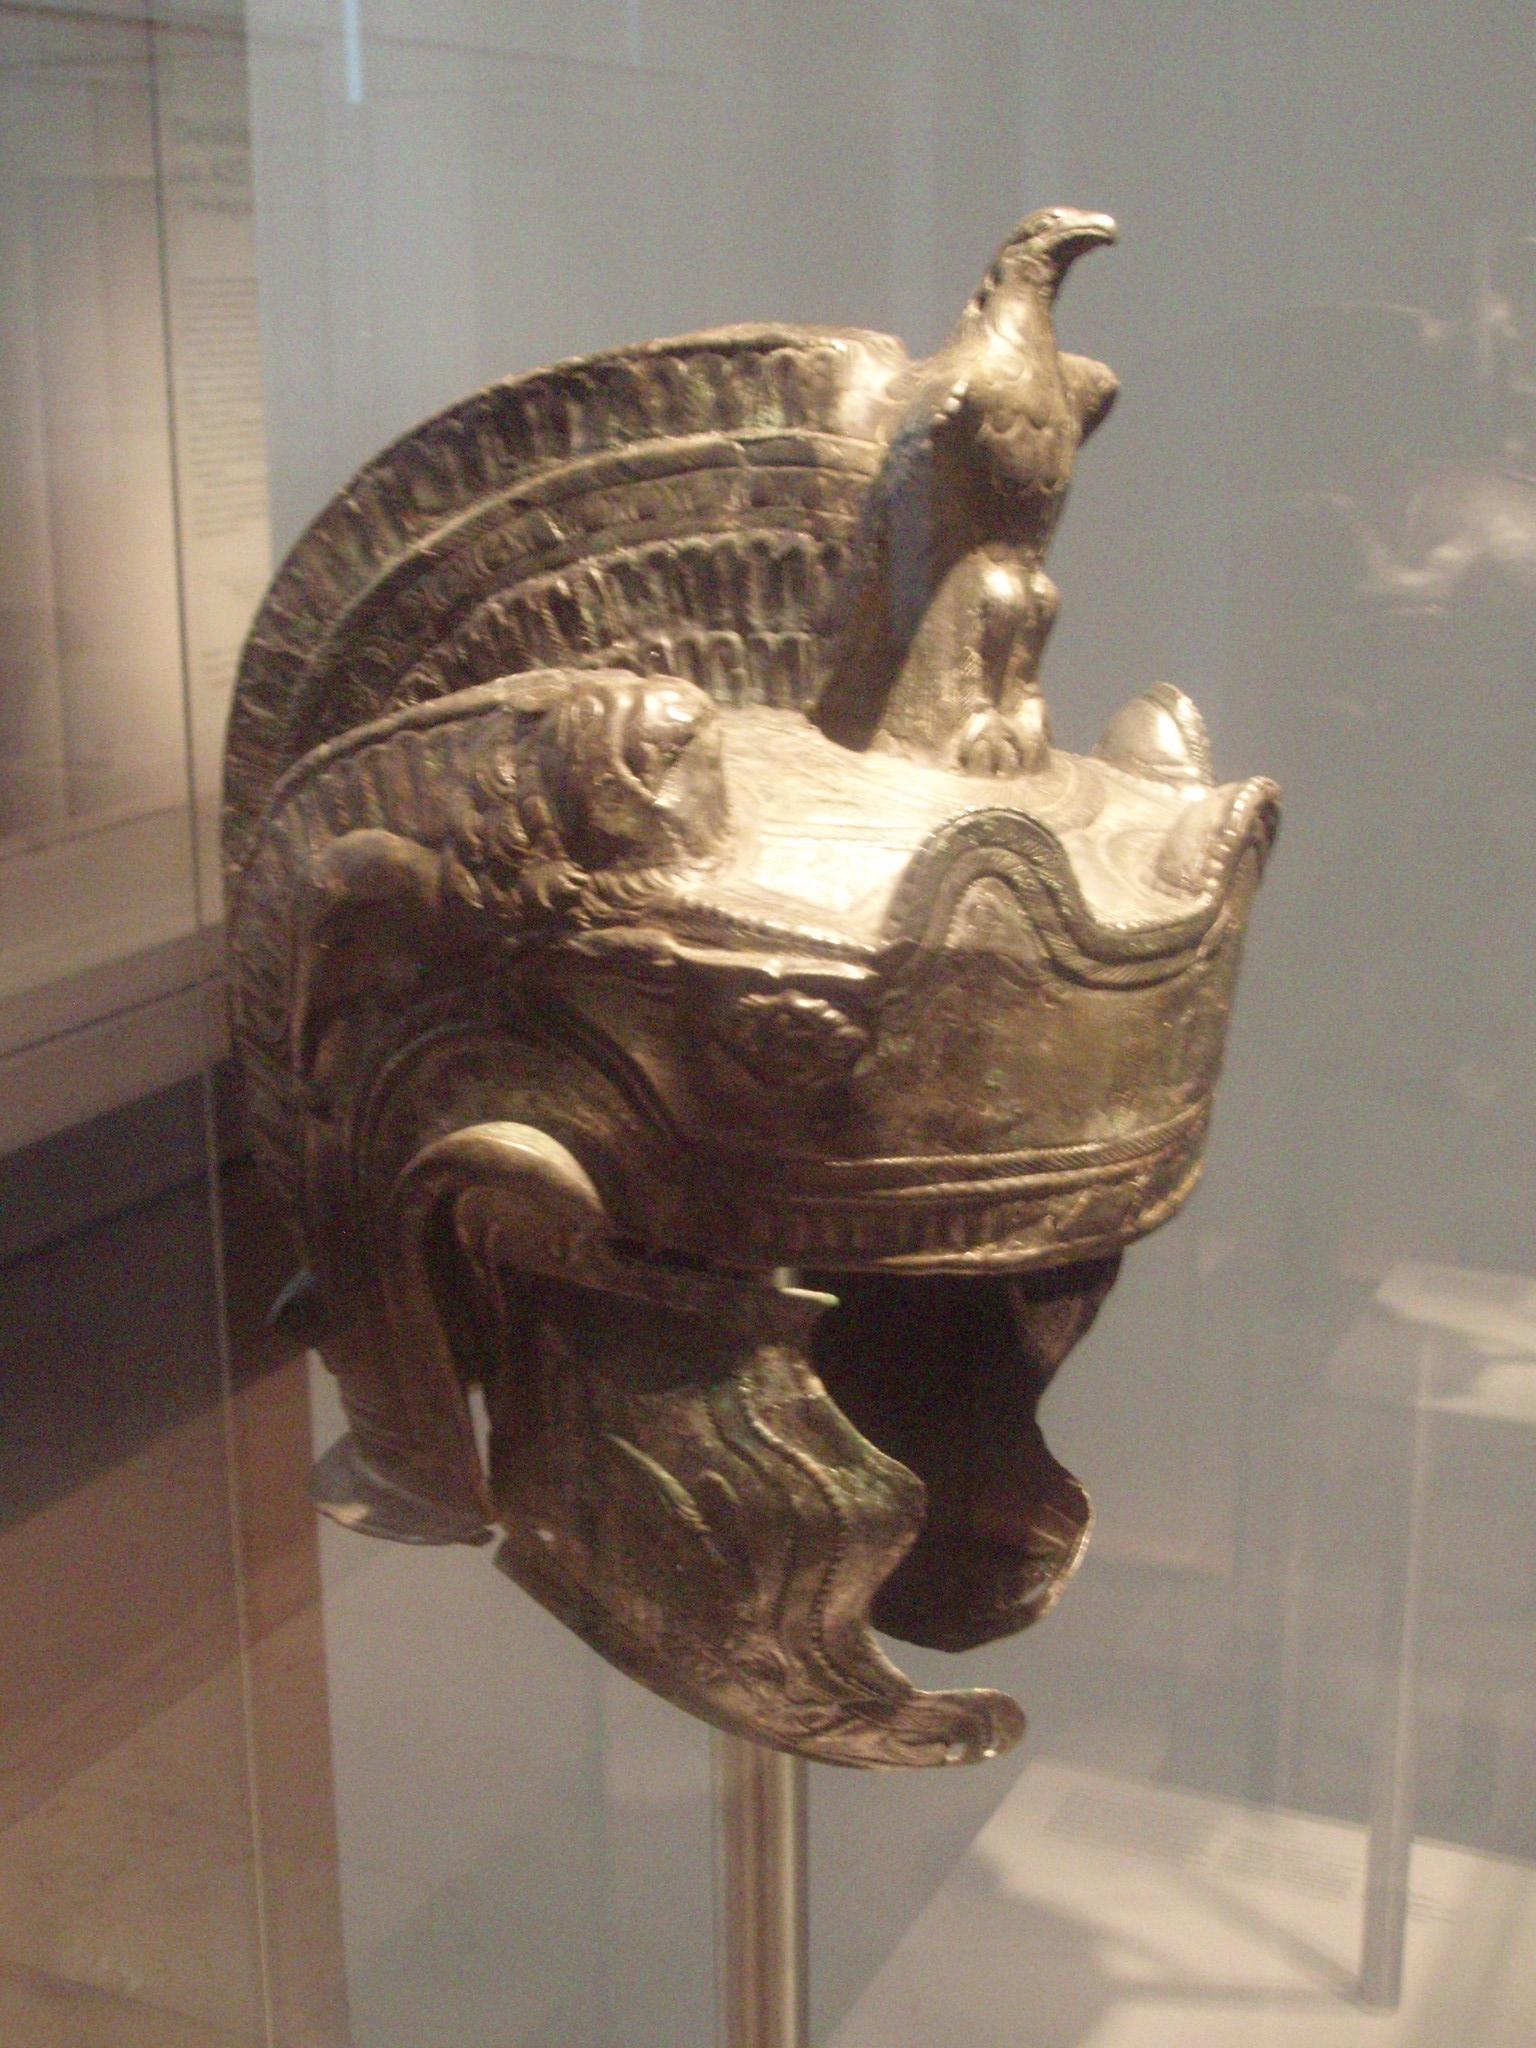 Roman parade helmet.